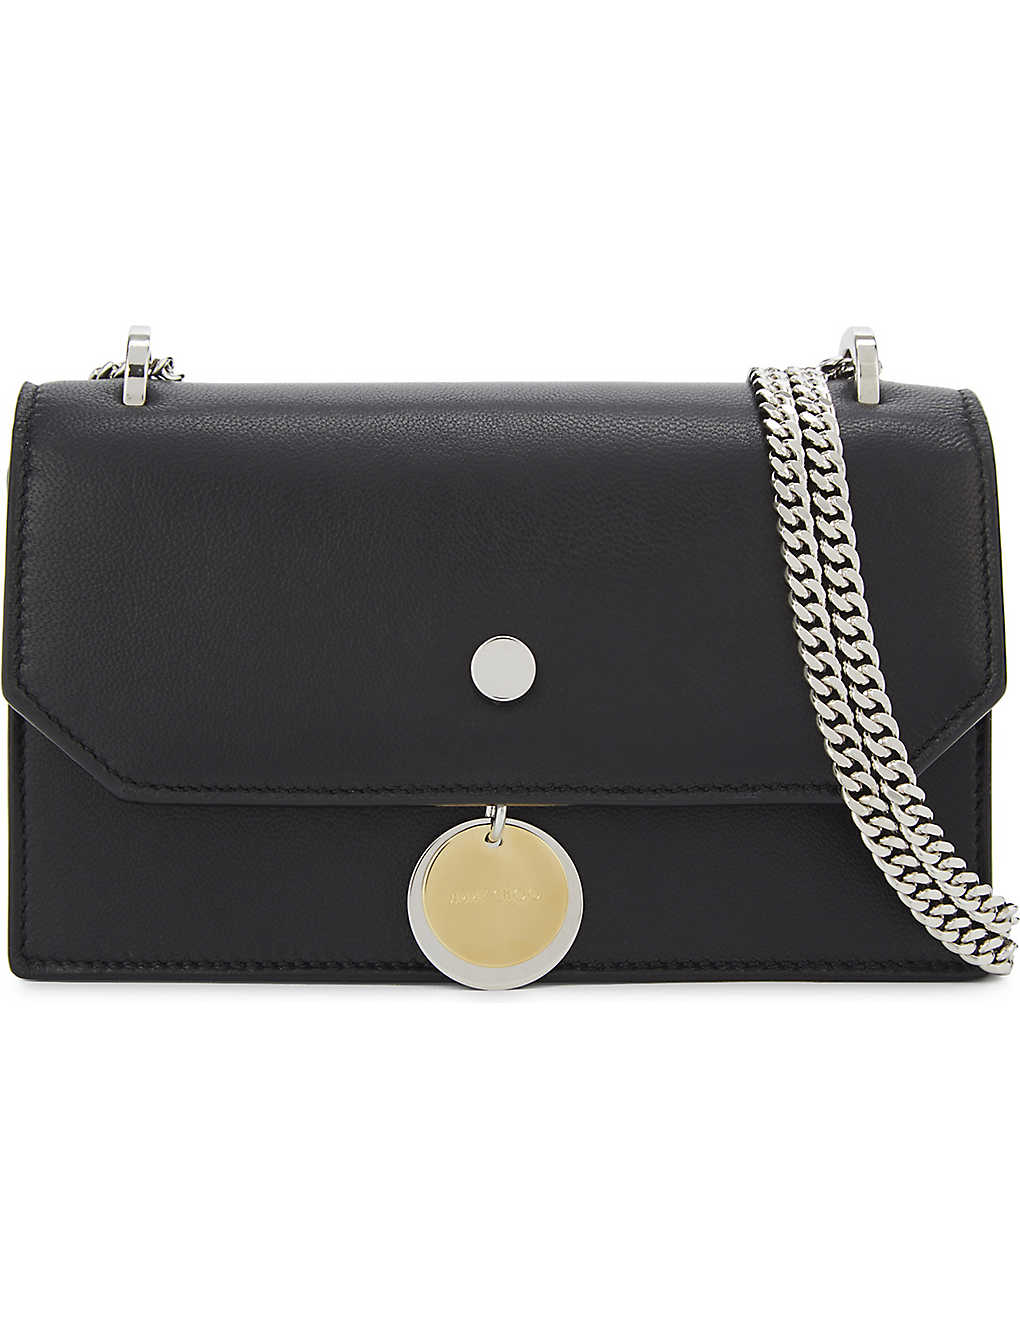 16b7005050c3 JIMMY CHOO - Finley leather cross-body bag